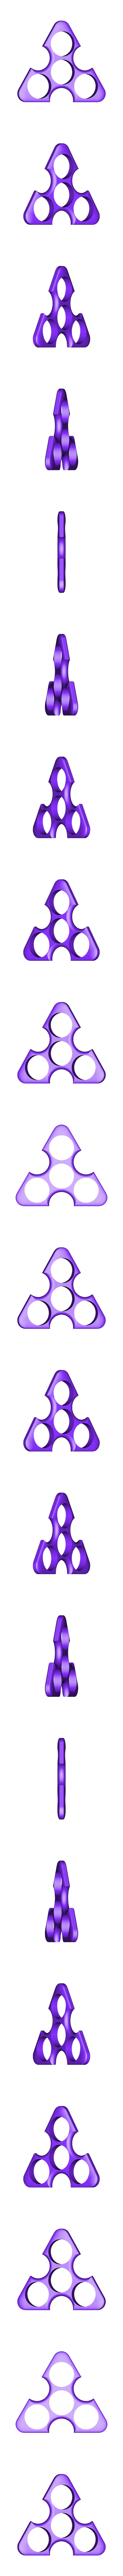 triangle_spinner_3.stl Télécharger fichier STL gratuit Triangle spinner • Design pour imprimante 3D, bda